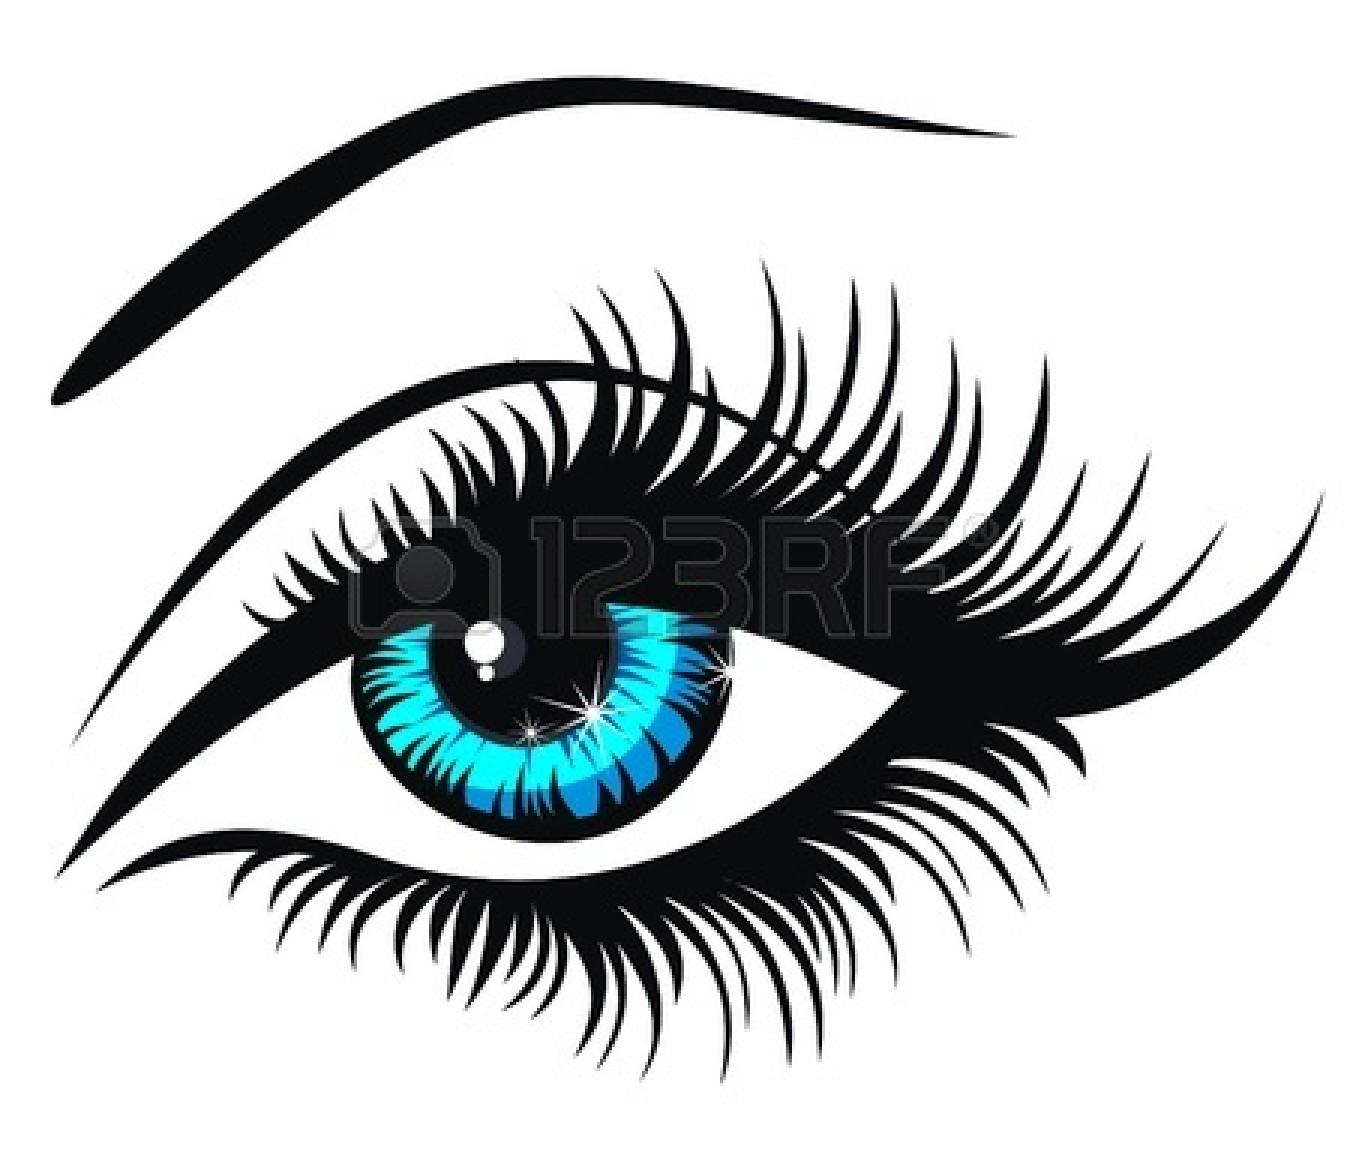 human eye clip art viewing clipart panda free clipart images rh clipartpanda com clipart images of an eye clipart of eyeglasses